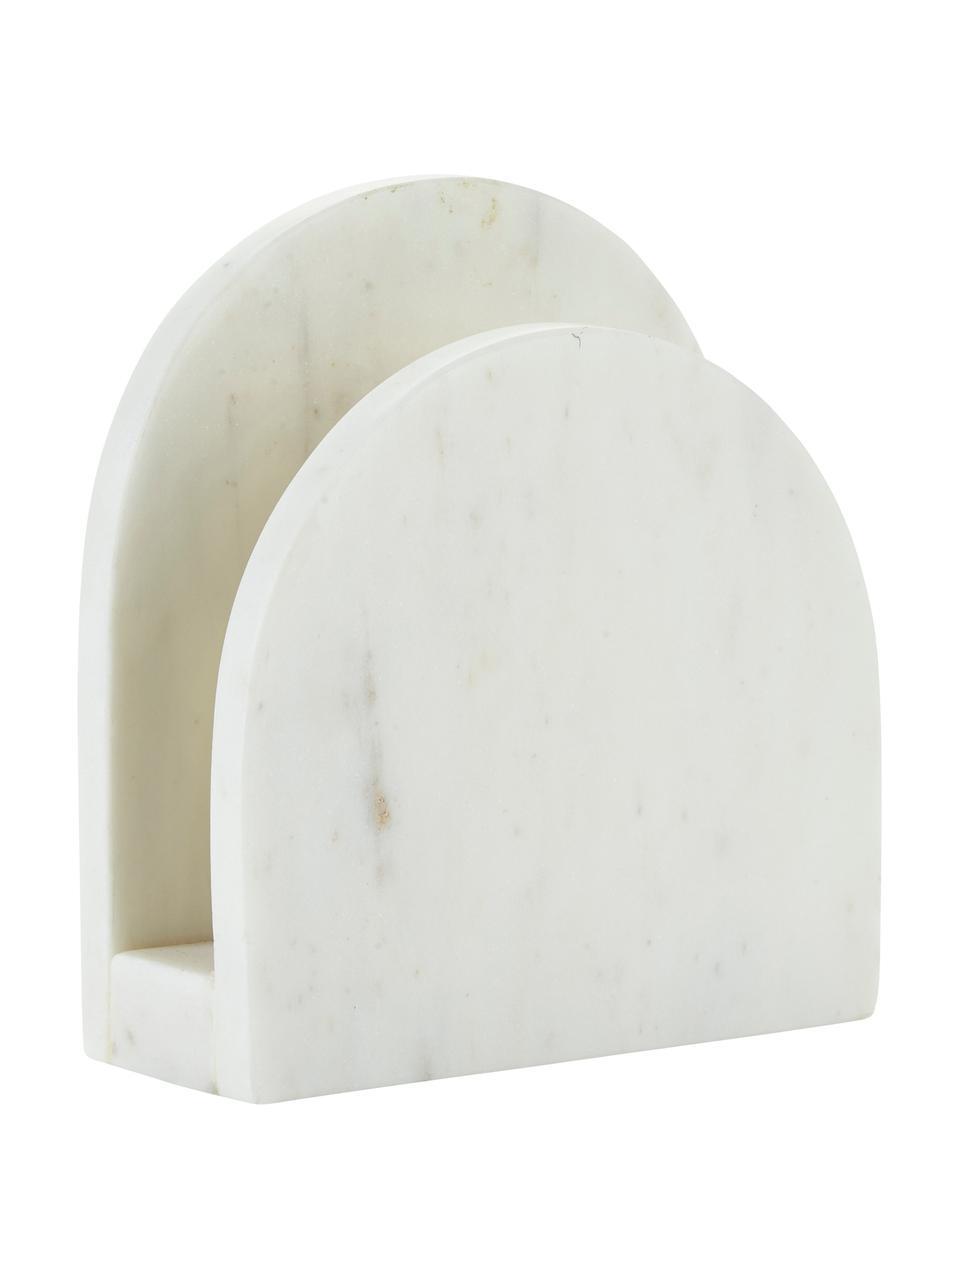 Marmeren servettenhouder Charlton, Gepolijst marmer, Wit, 15 x 14 cm